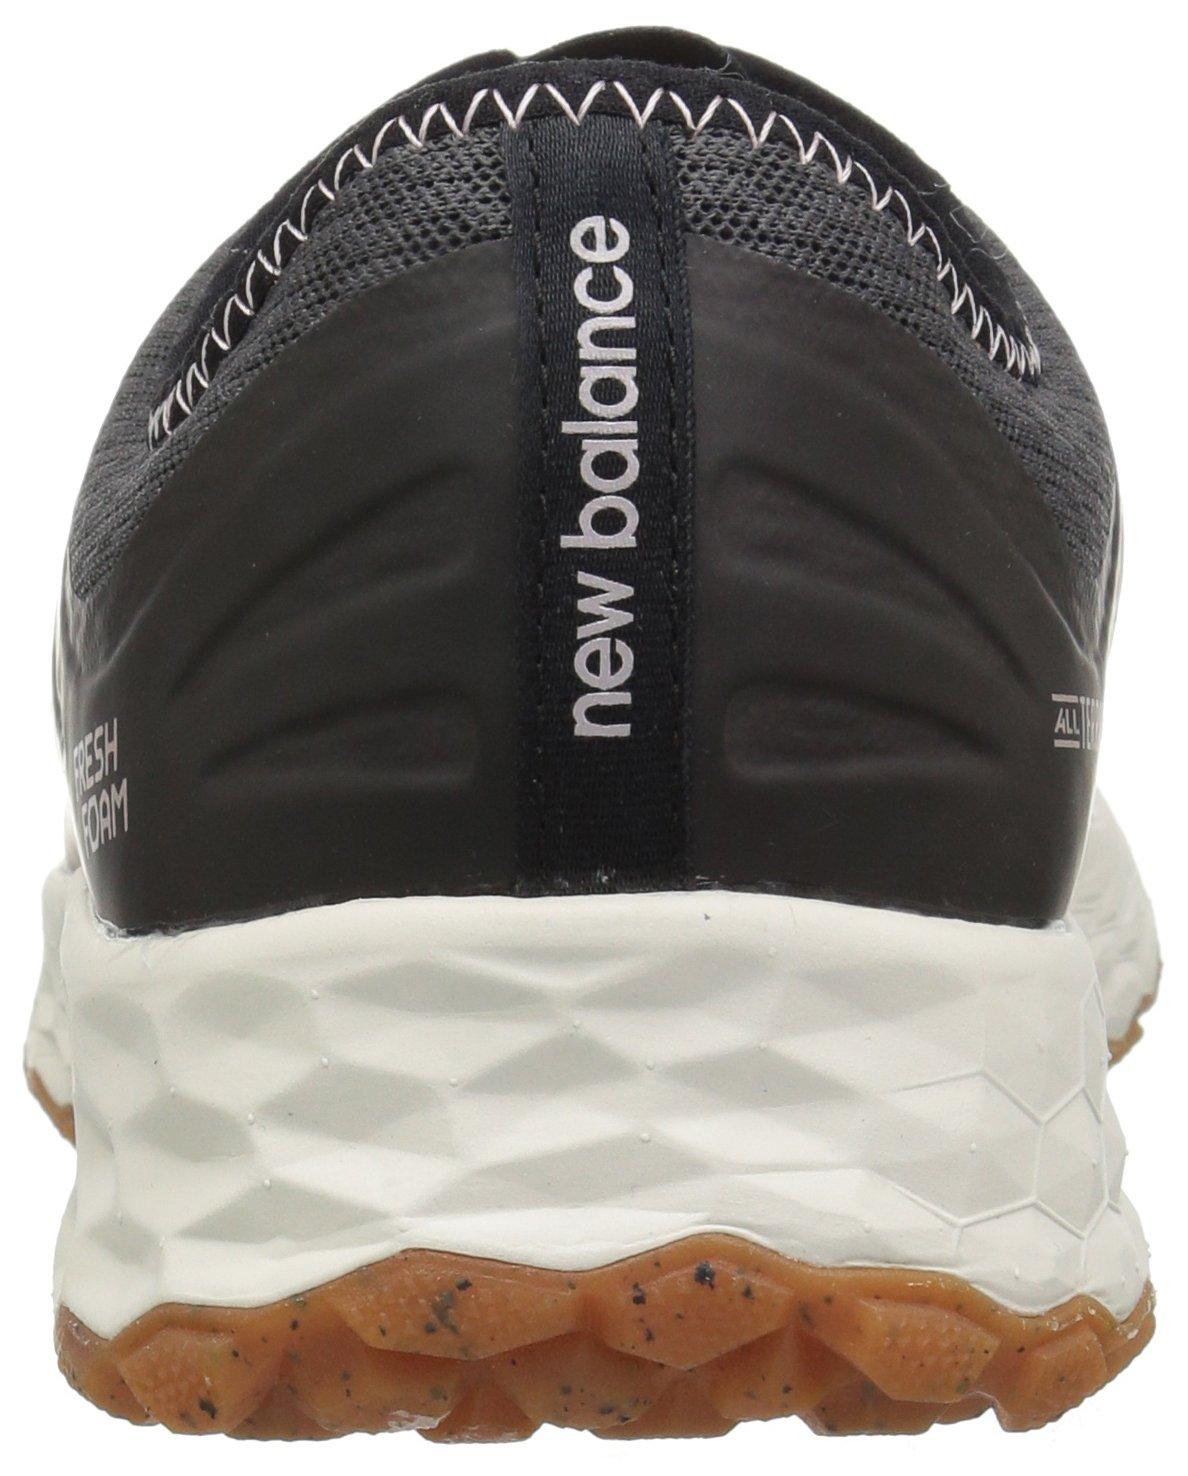 New Balance Fresh Women's Kaymin Trail v1 Fresh Balance Foam Trail Running Shoe B0751TKFNT 5 B(M) US|Black f2bfe7